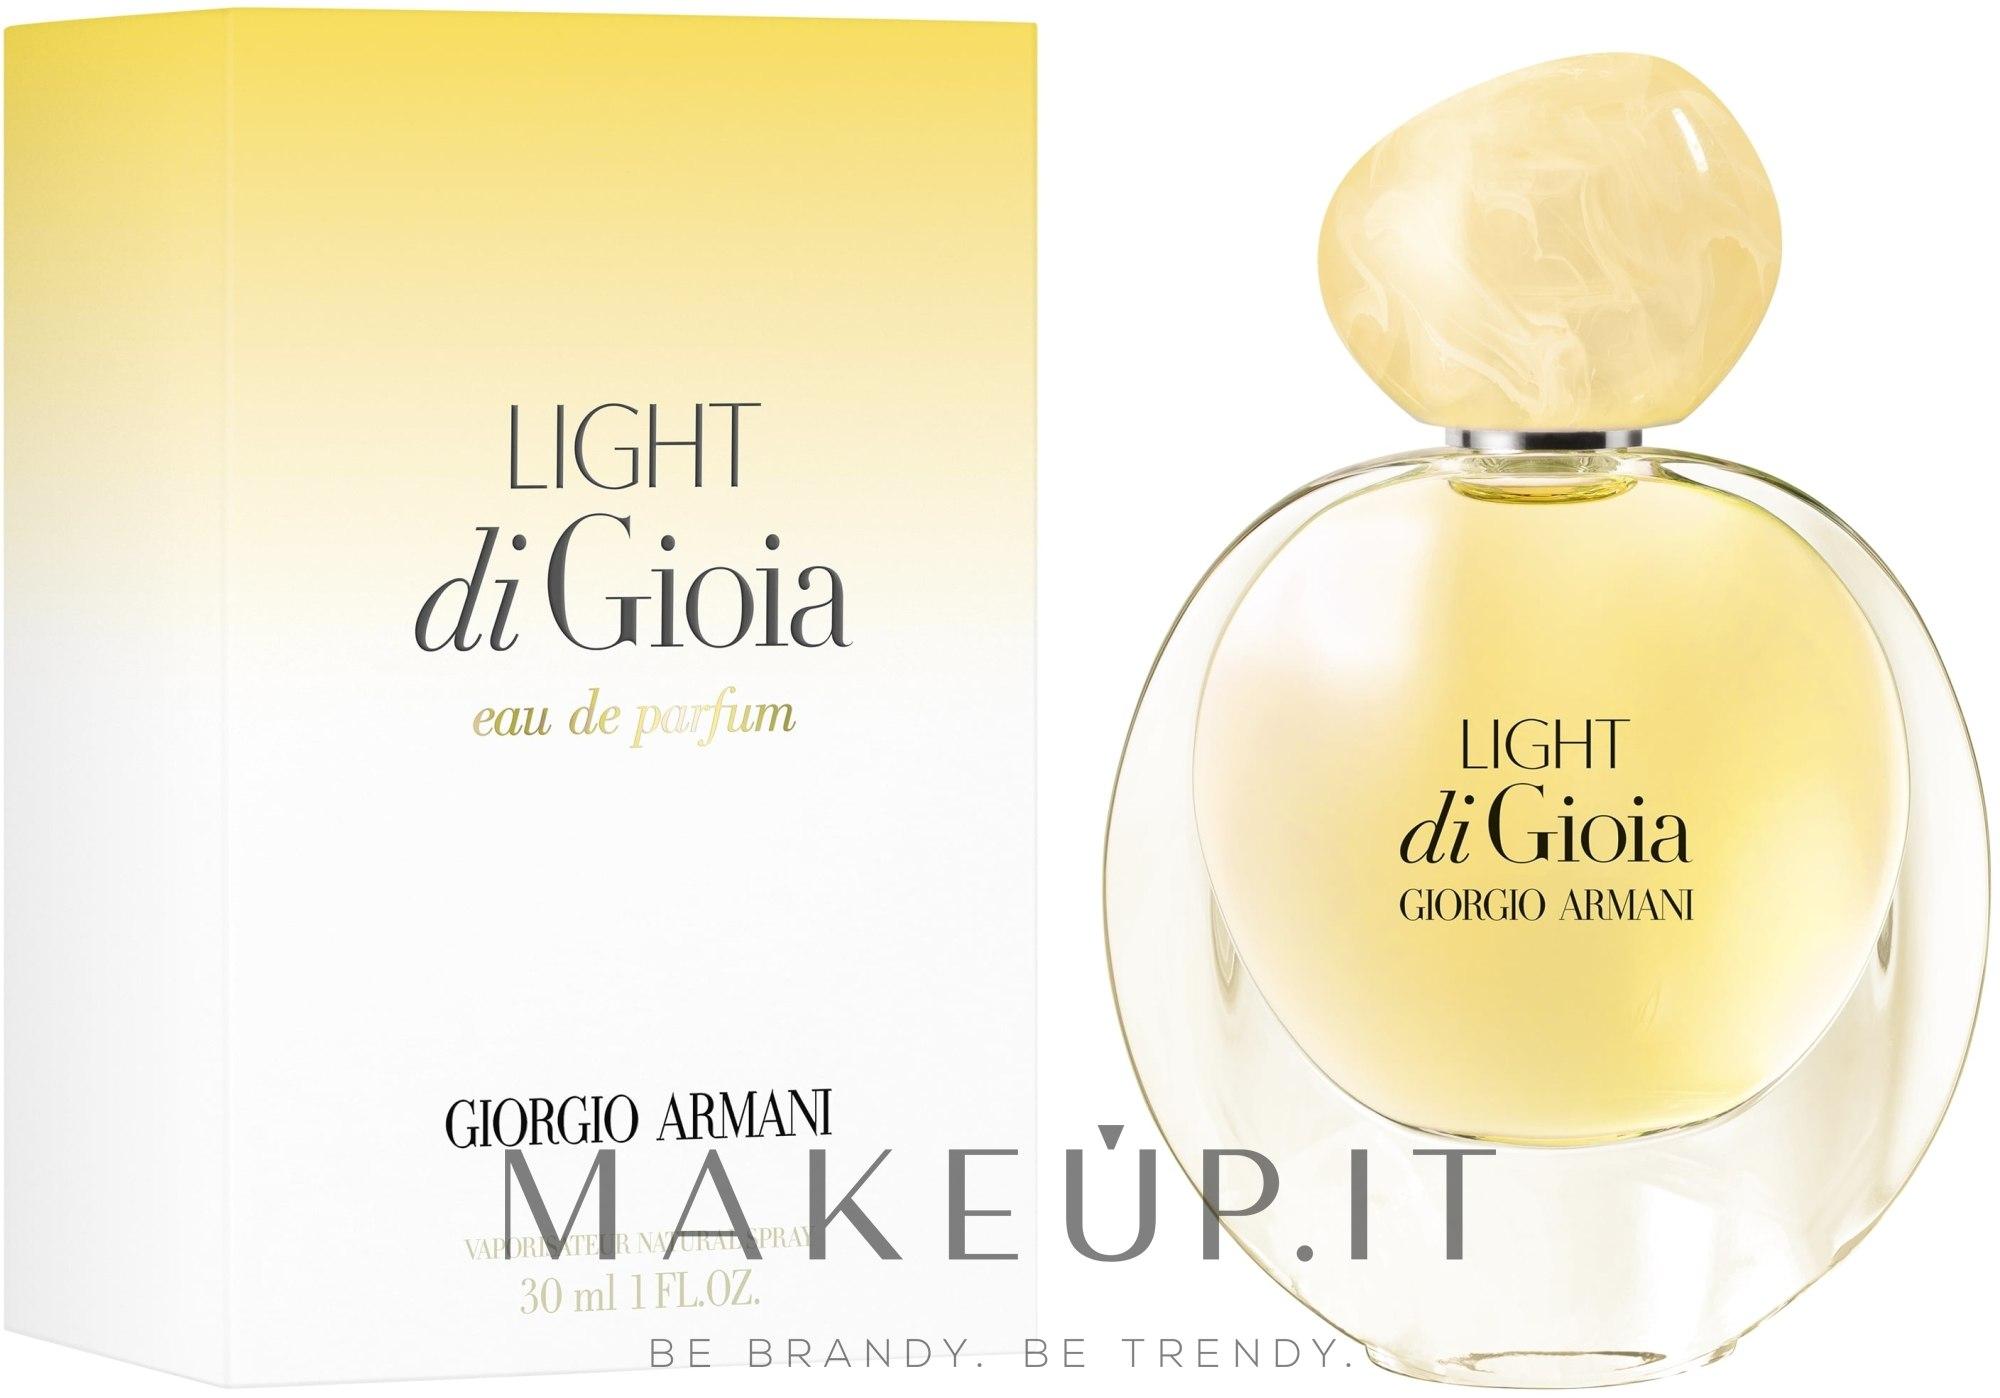 Giorgio Armani Light di Gioia - Eau de Parfum — foto 30 ml